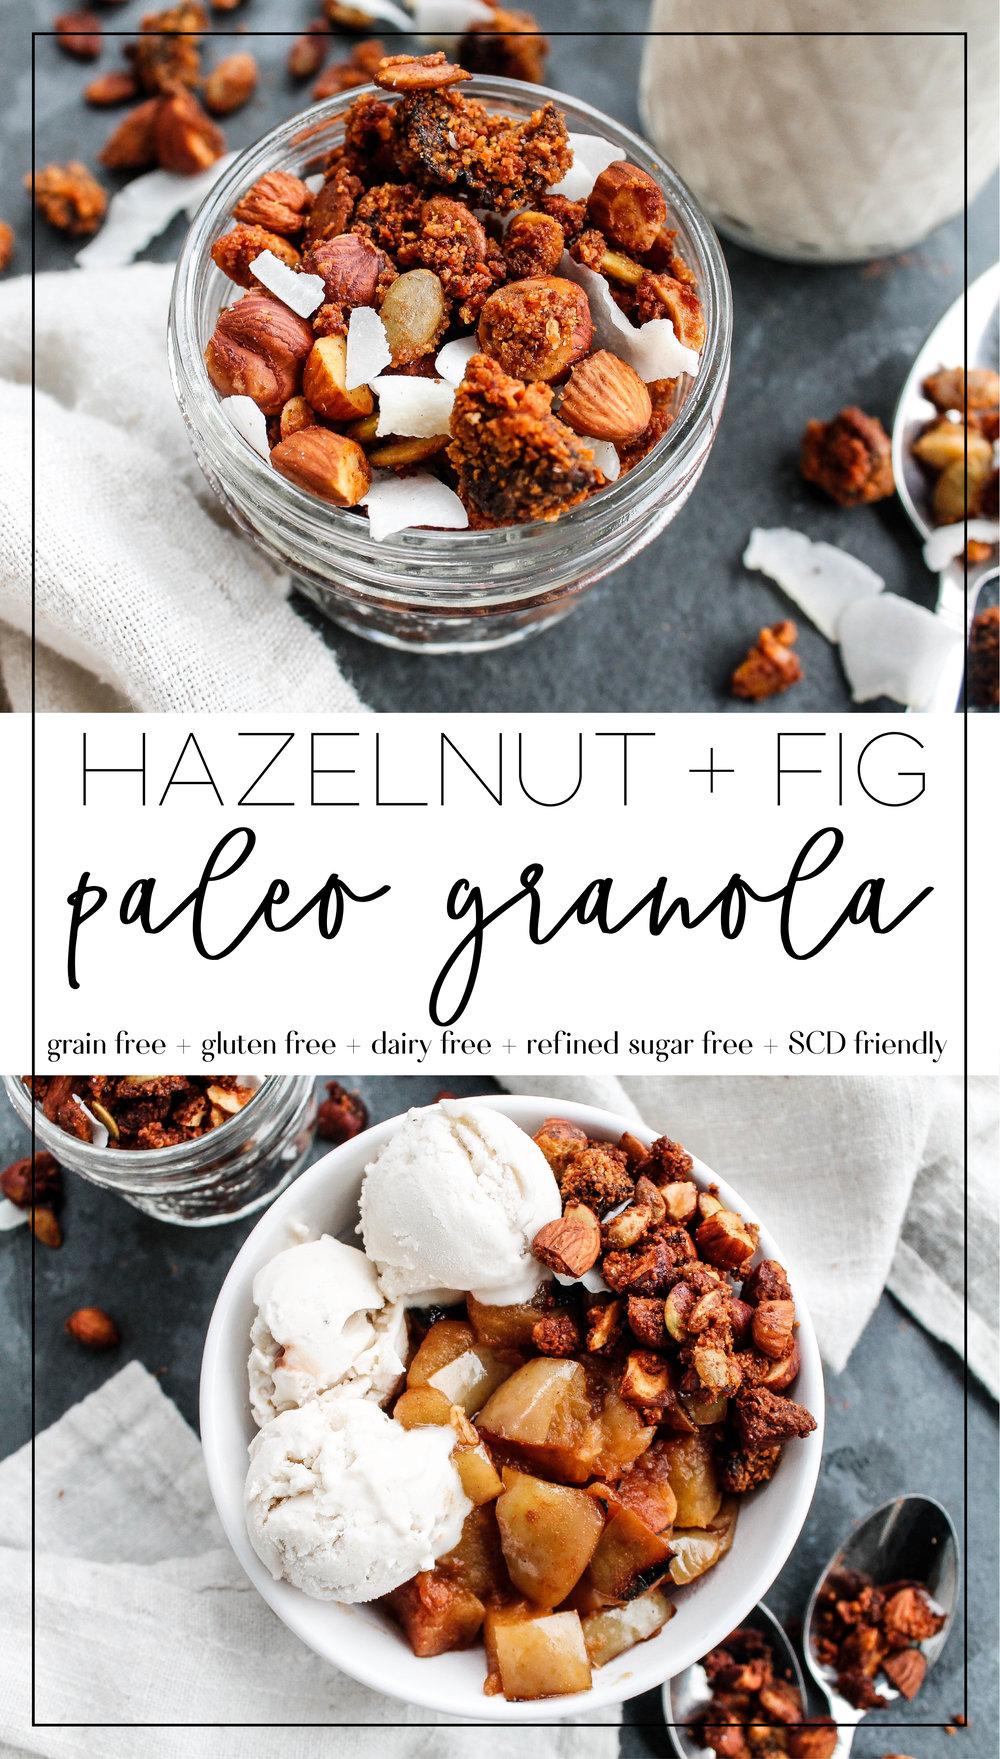 hazelnut fig paleo granola